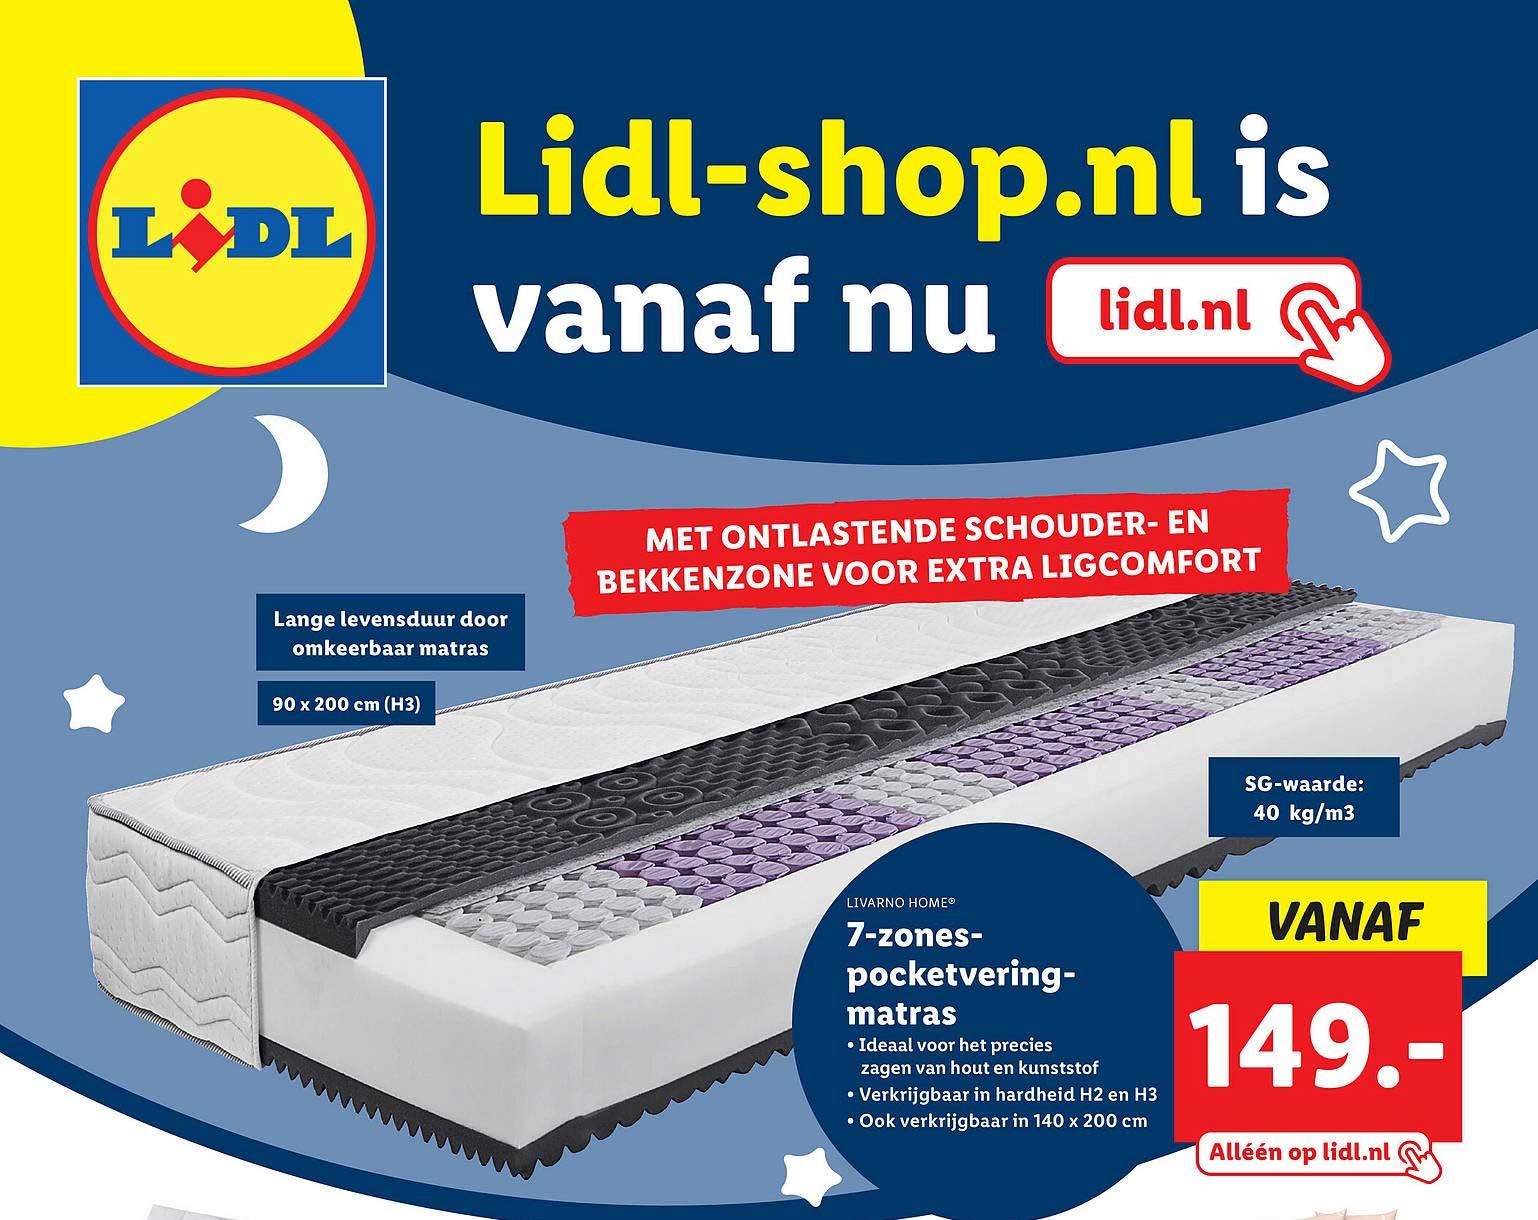 Lidl Shop Livarno Home® 7-Zones-Pocketveringmatras